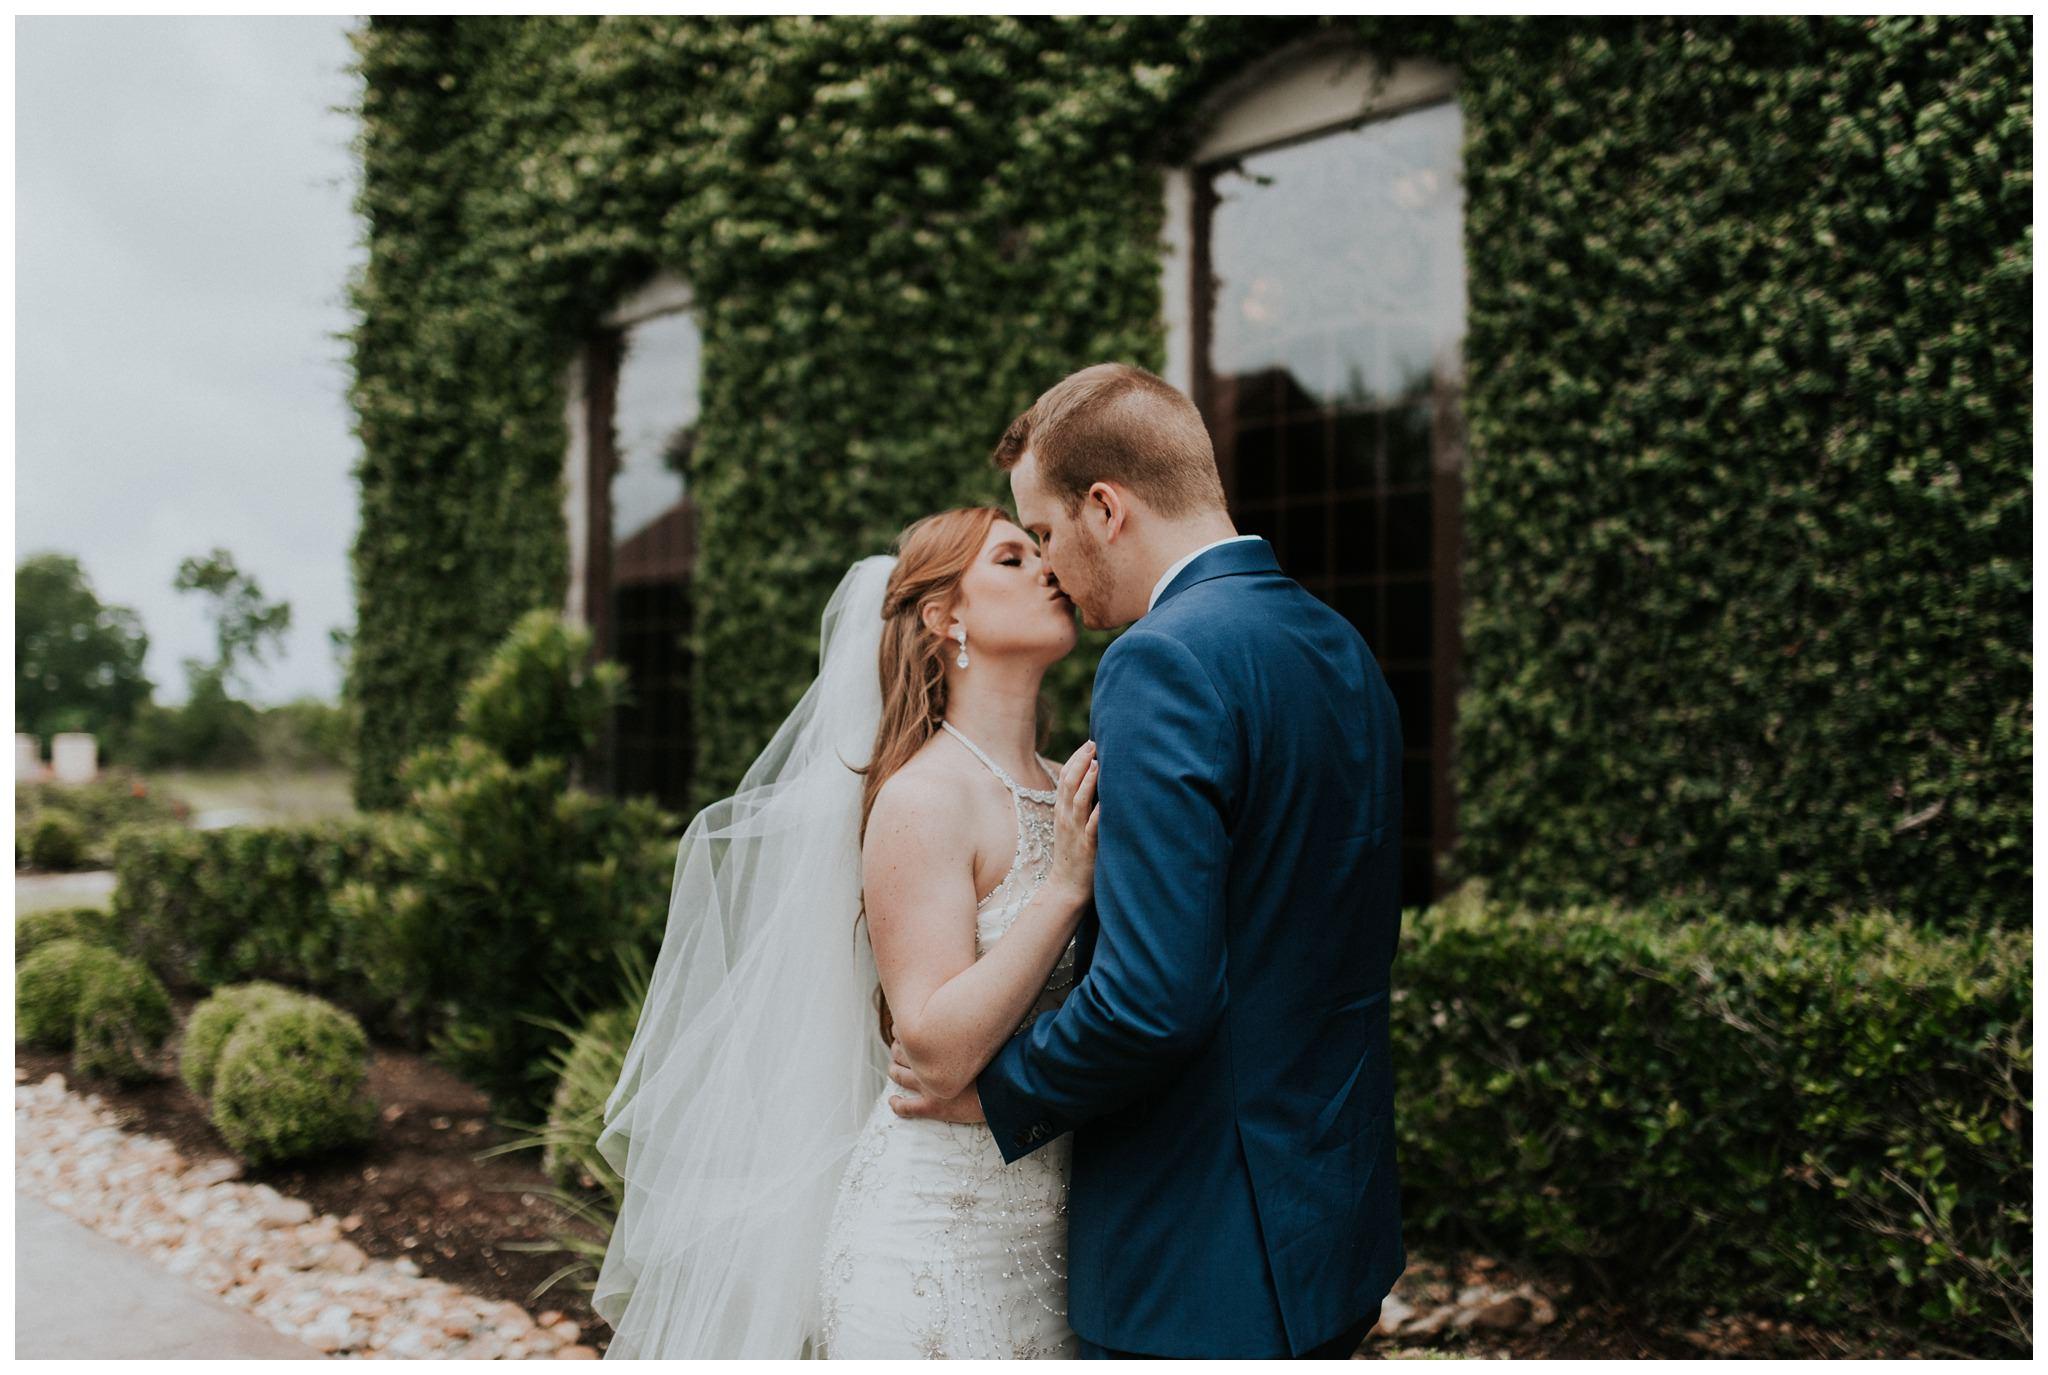 Summertime Olde Dobbin Station - Magnolia Wedding - The Woodlands Texas Wedding Photographer-2414.jpg